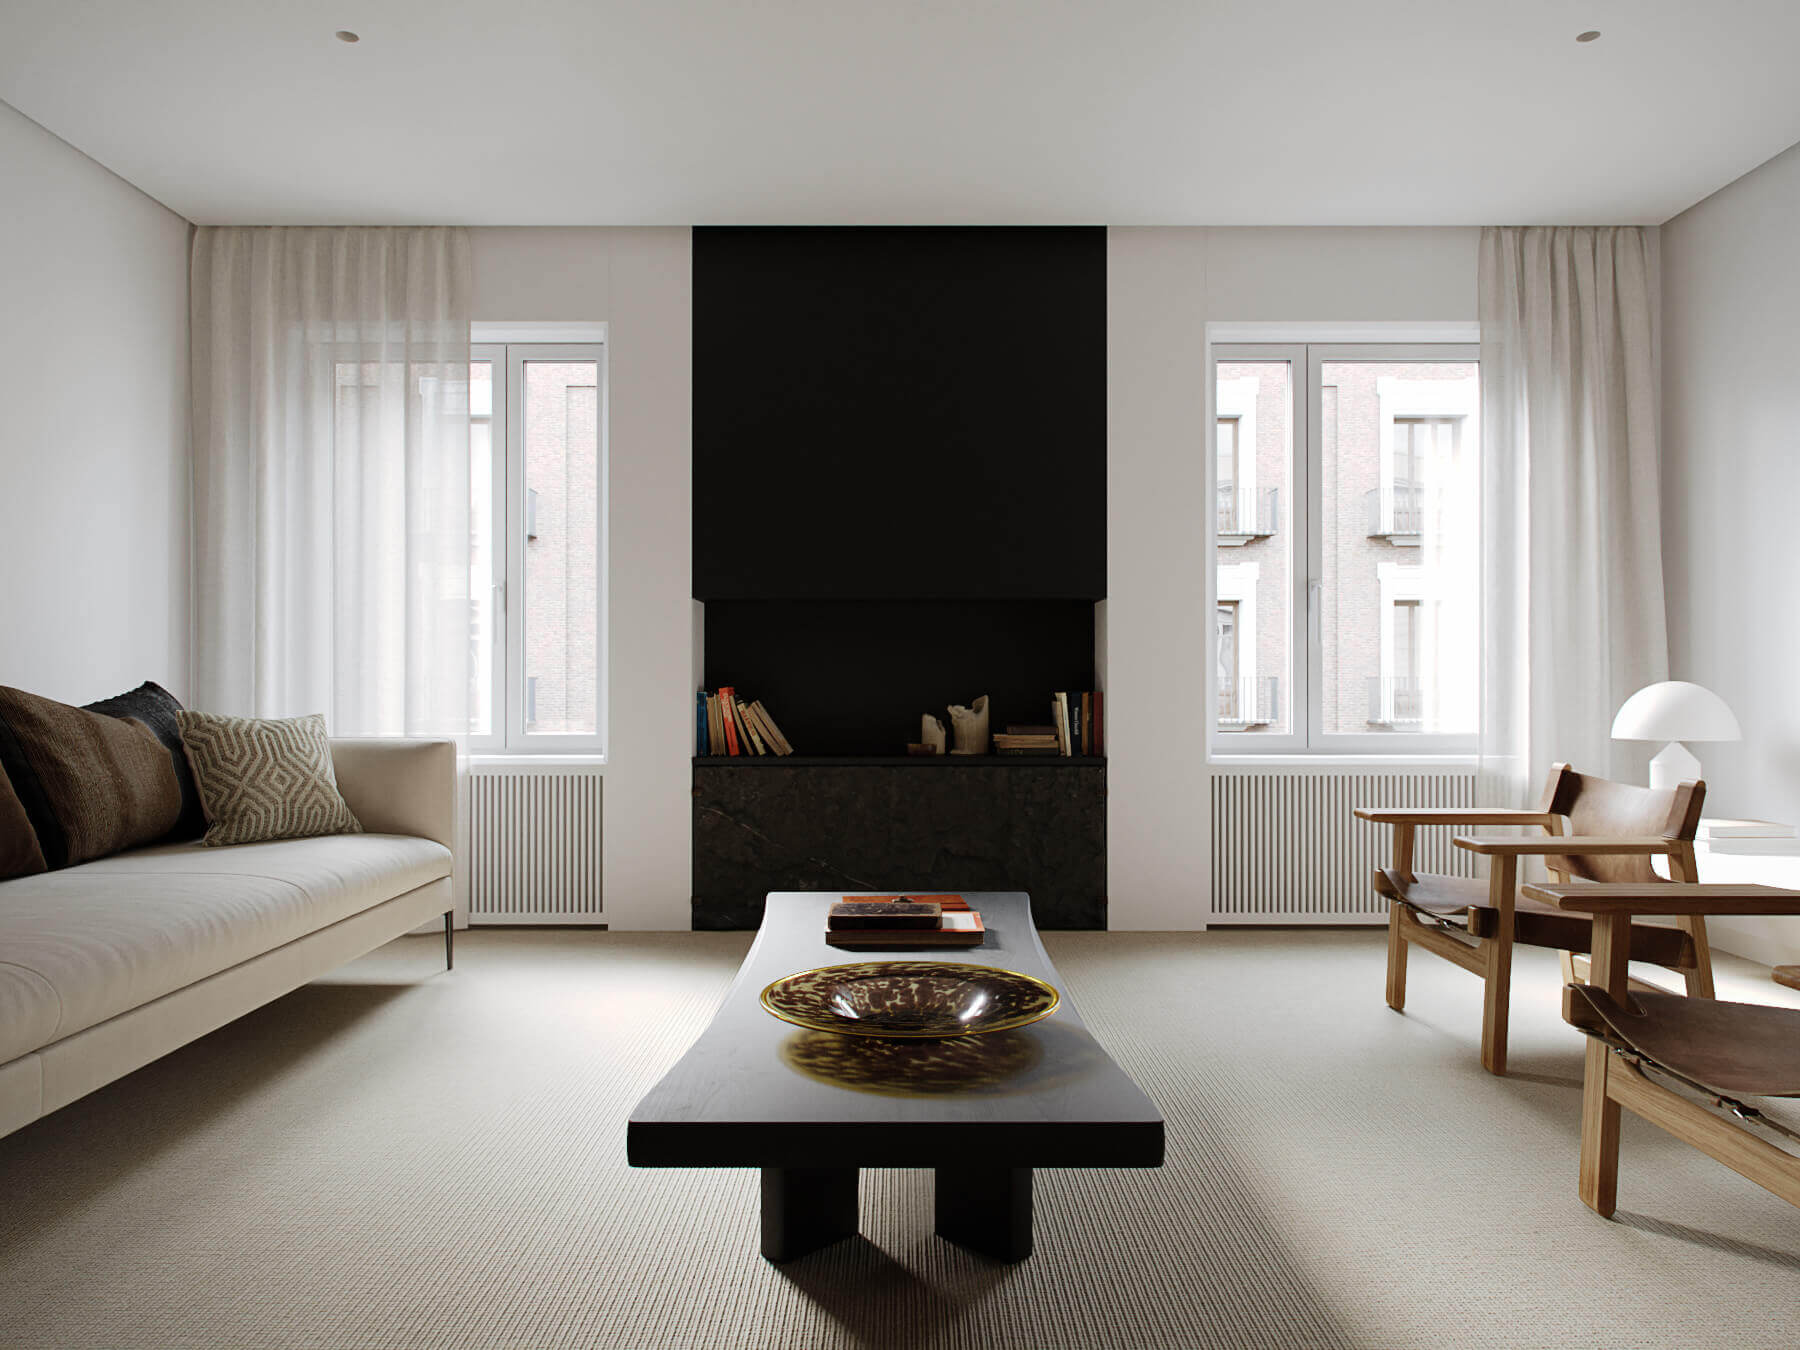 Trendy Living & Kitchen apartment sofa couch - cgi visualization